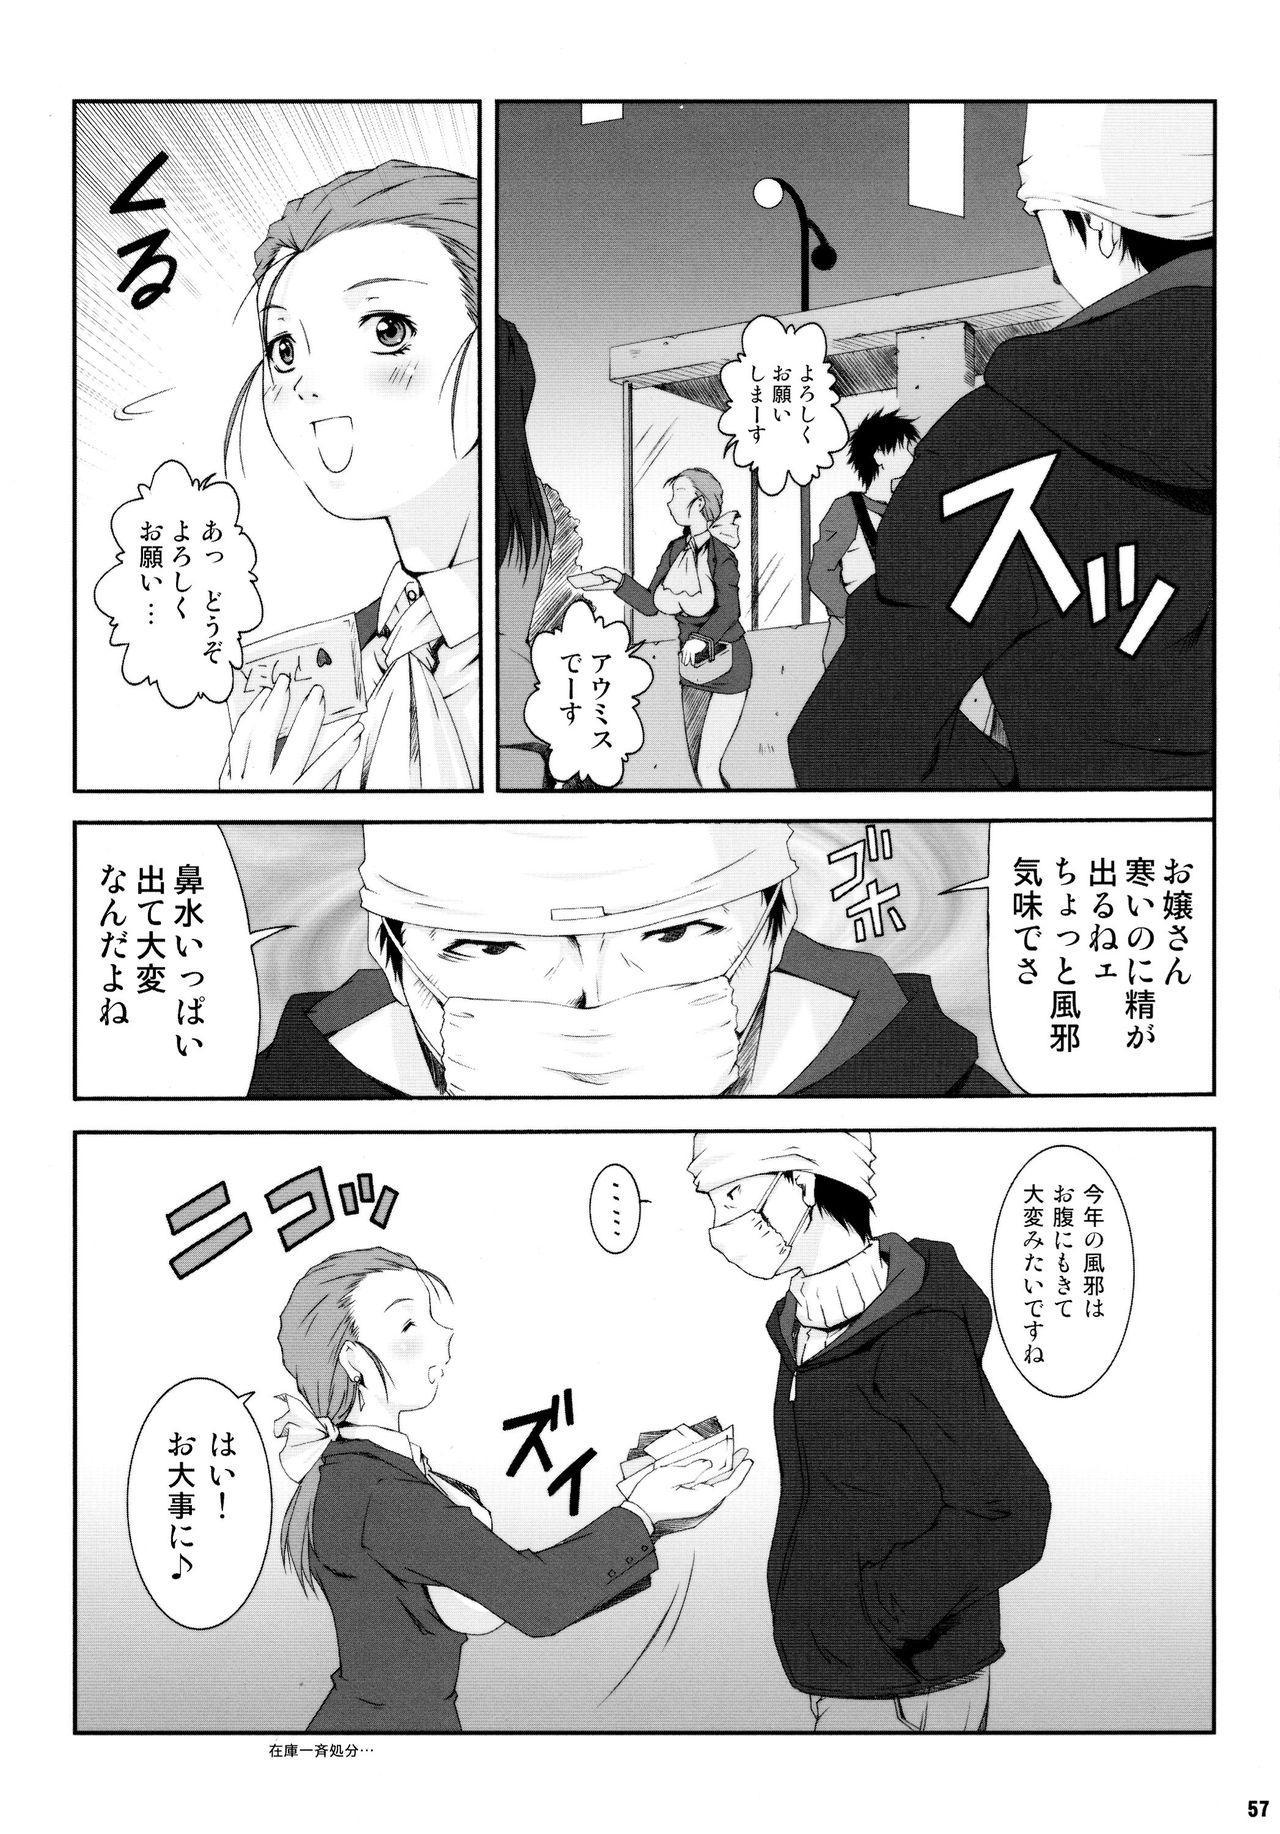 Misoka no 5 56